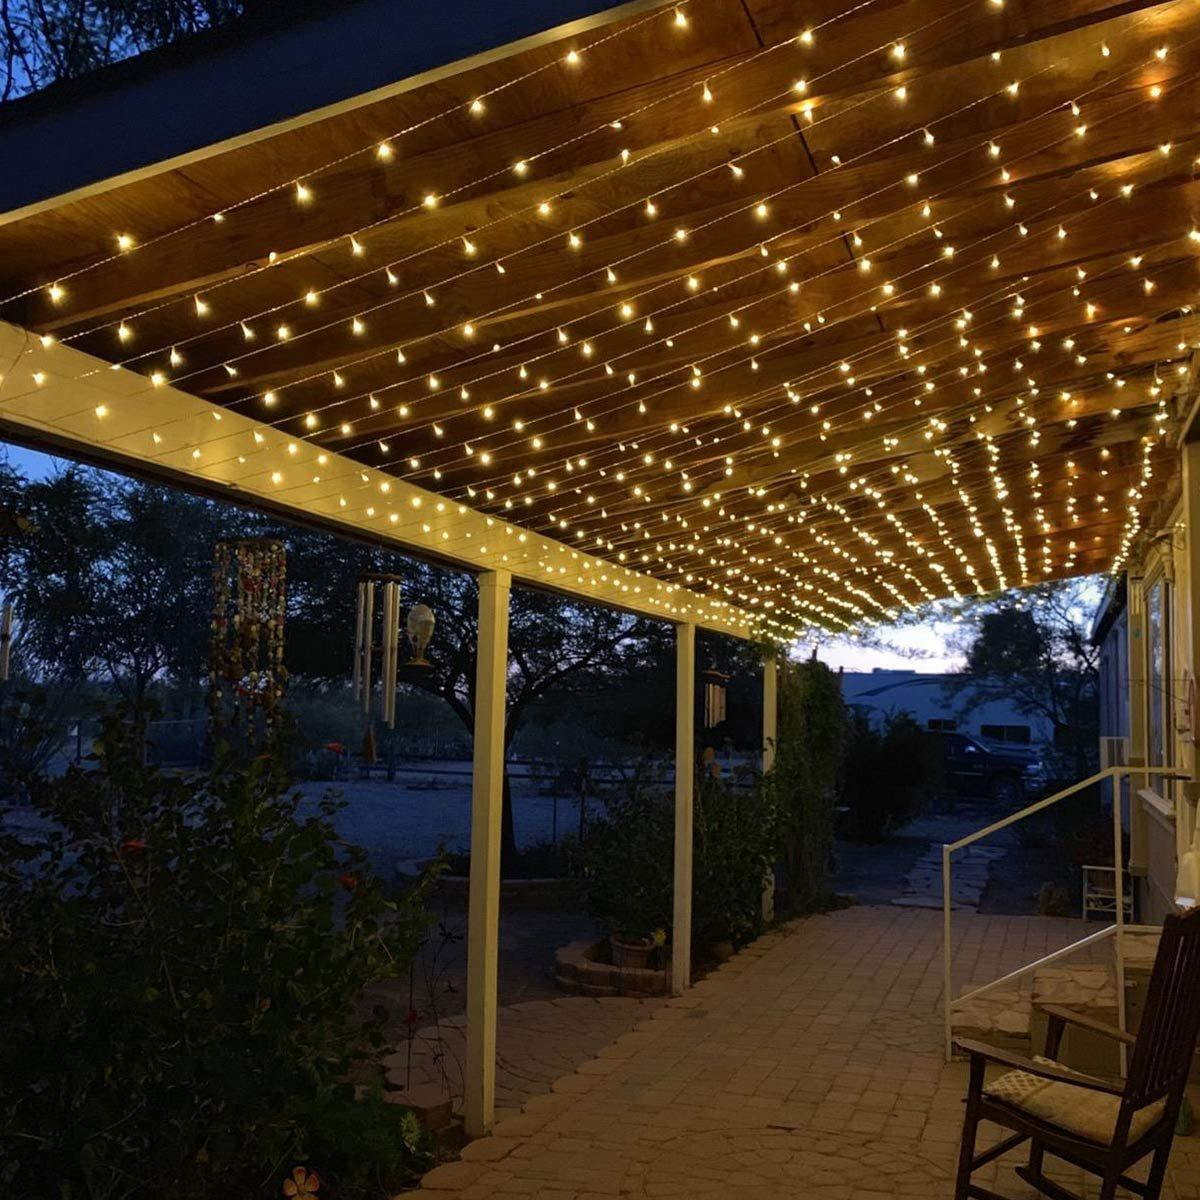 Best 3 Gazebo Lights Tried Tested Gazebo Lighting 2021